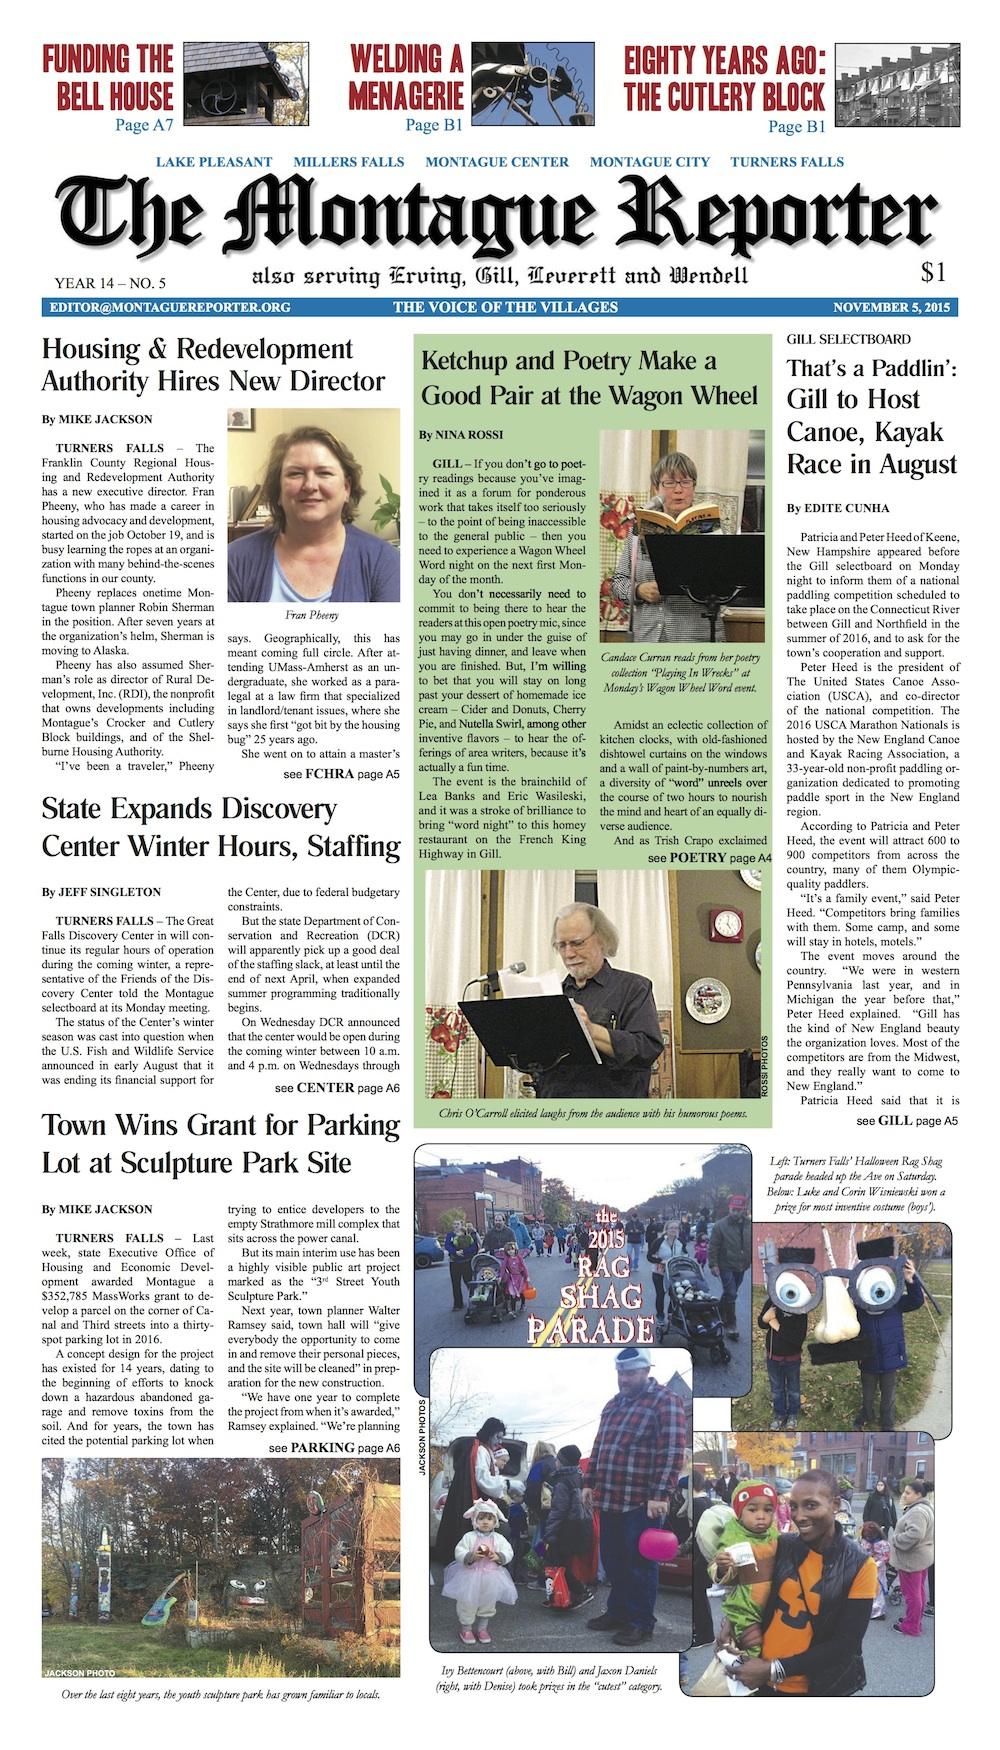 Page A1, November 5, 2015